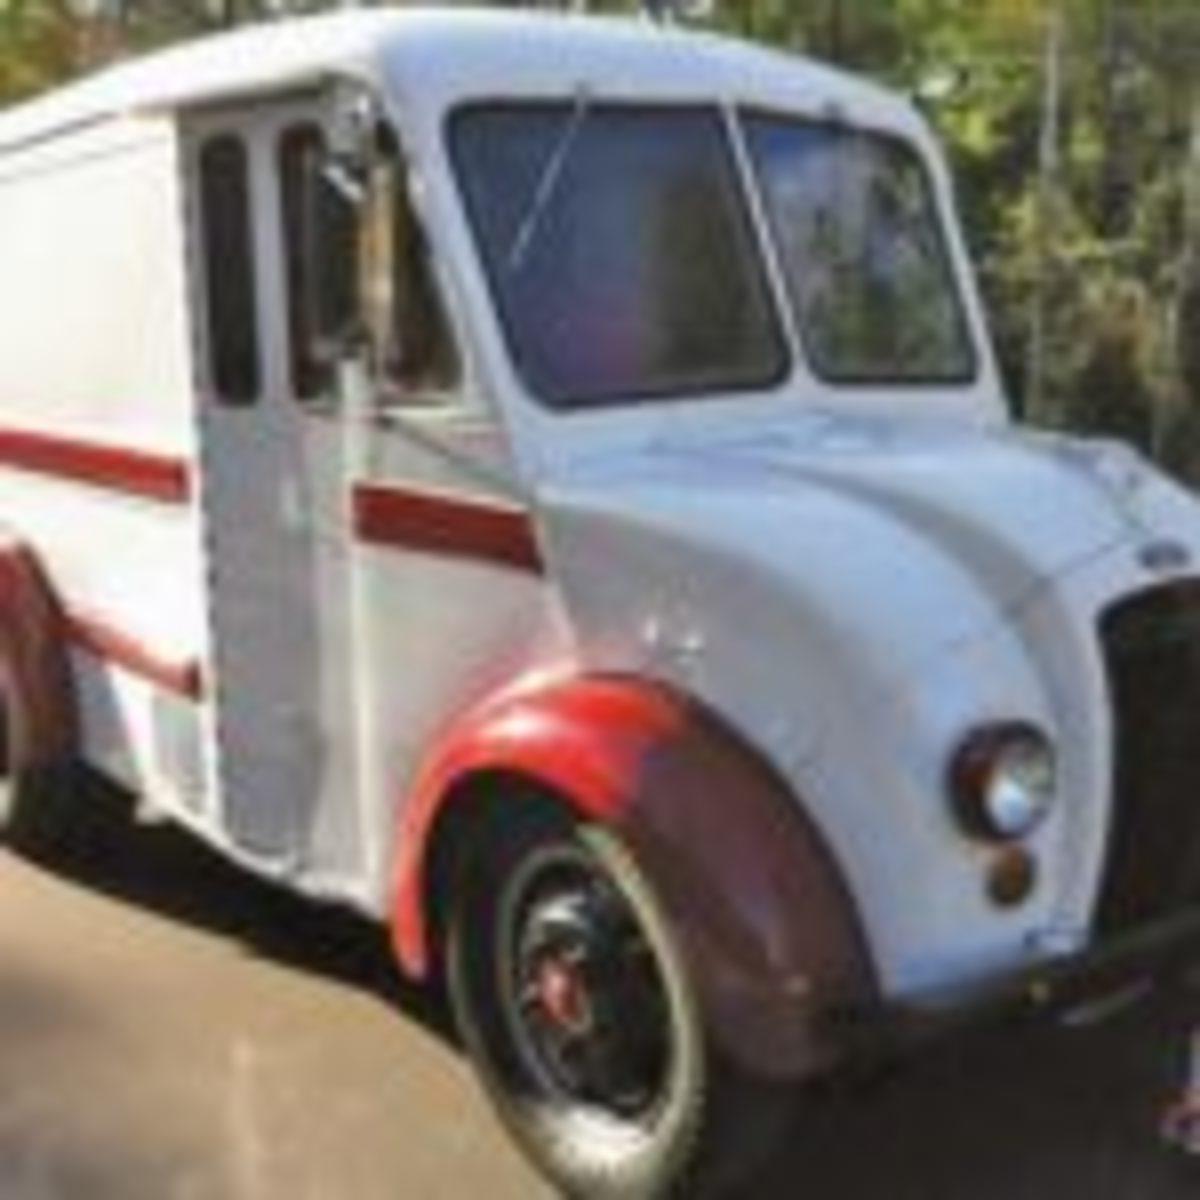 Divco Model U Rosenberger's Dairies Delivery truck